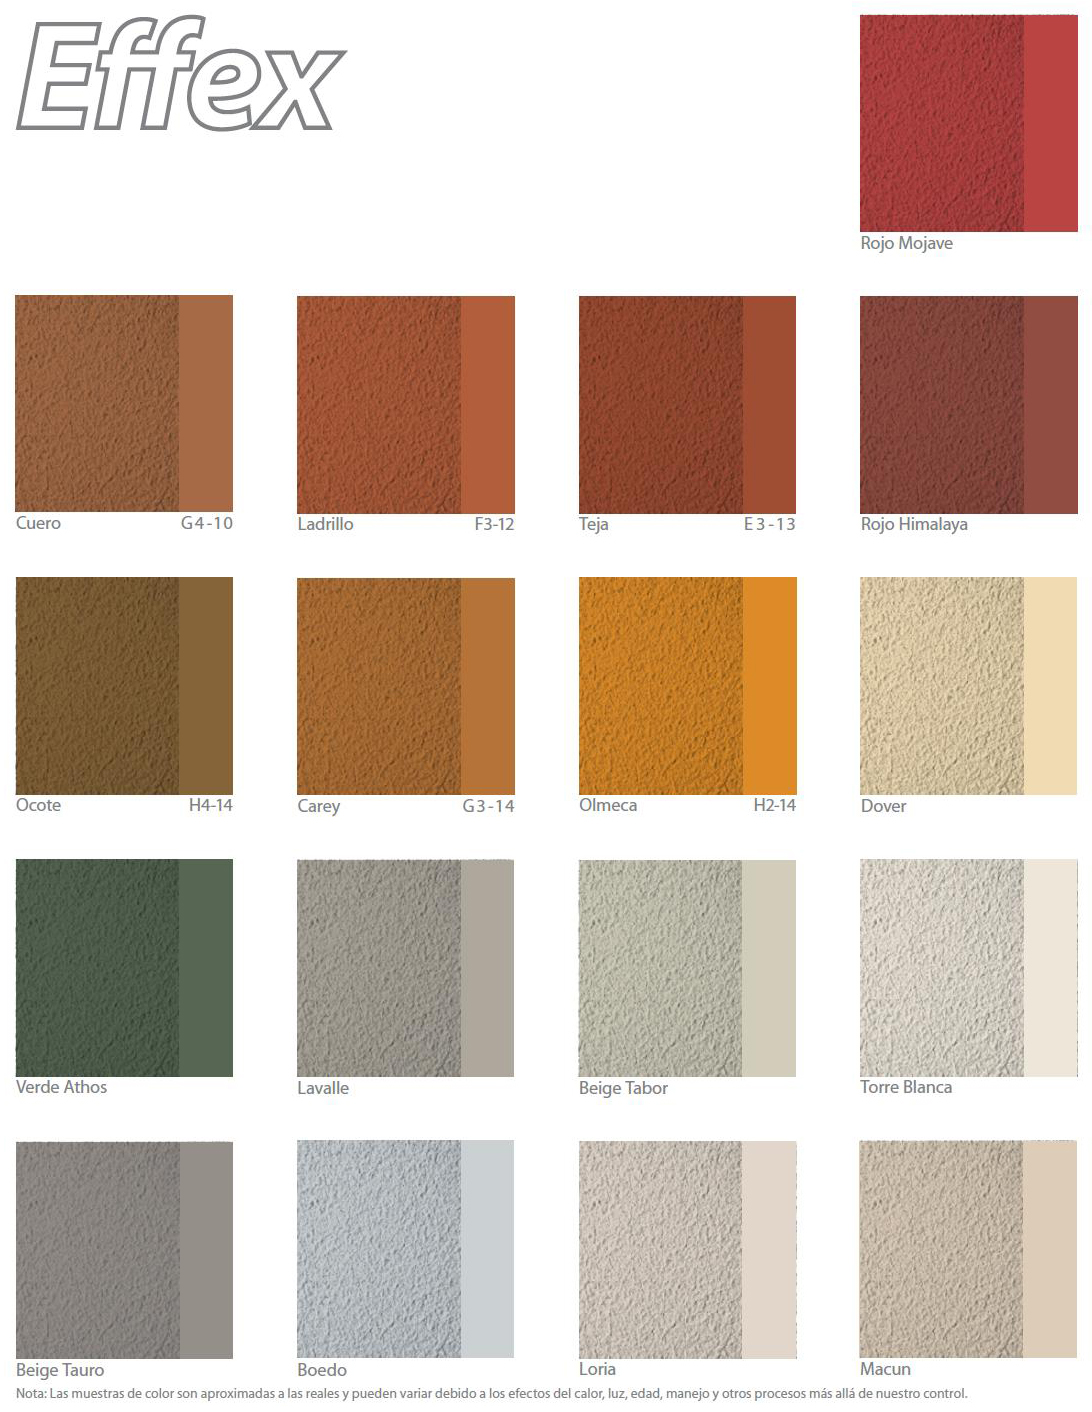 Decorar cuartos con manualidades pintura para exteriores for Pintura para exteriores